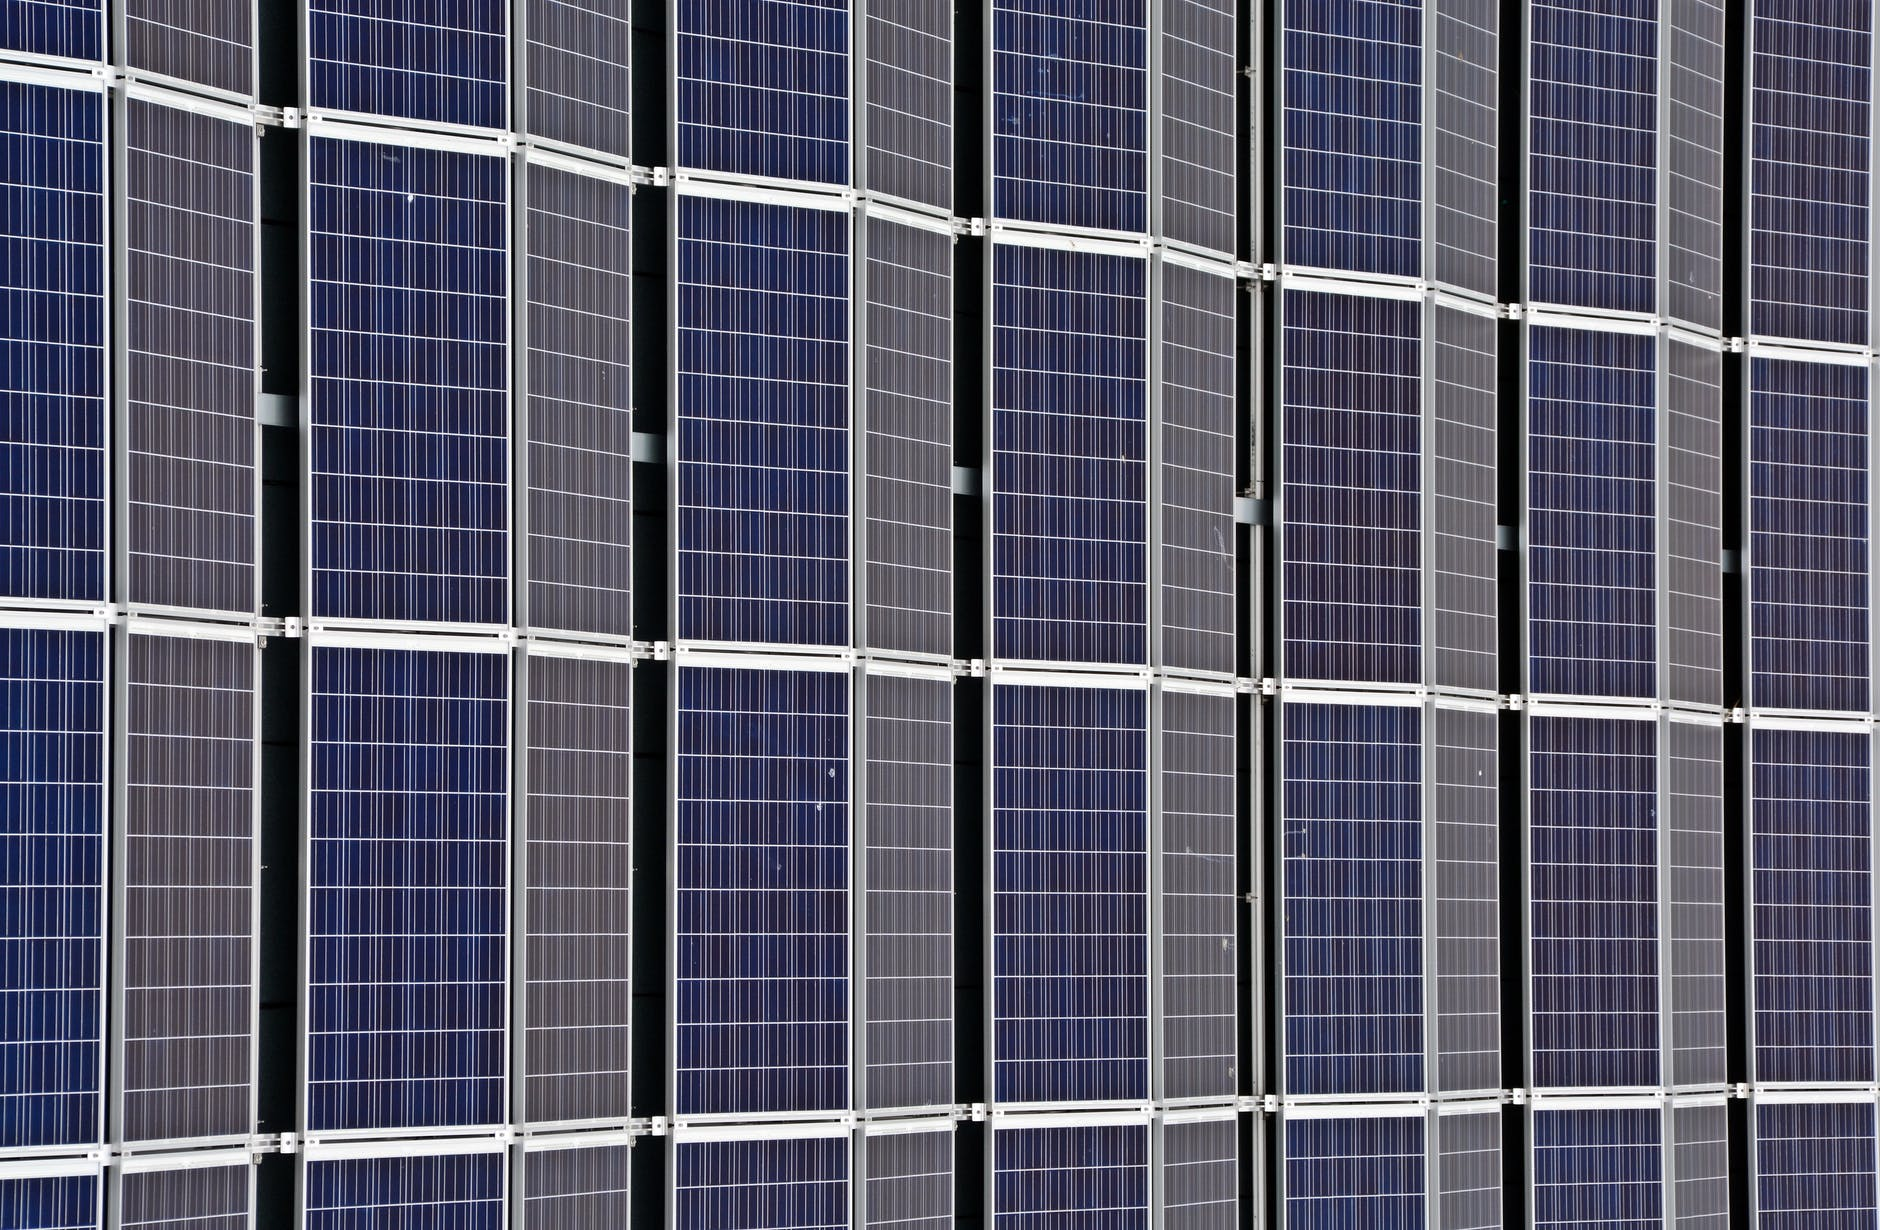 https://images.pexels.com/photos/159243/solar-solar-cells-photovoltaic-environmentally-friendly-159243.jpeg?auto=compress&cs=tinysrgb&dpr=2&h=650&w=940